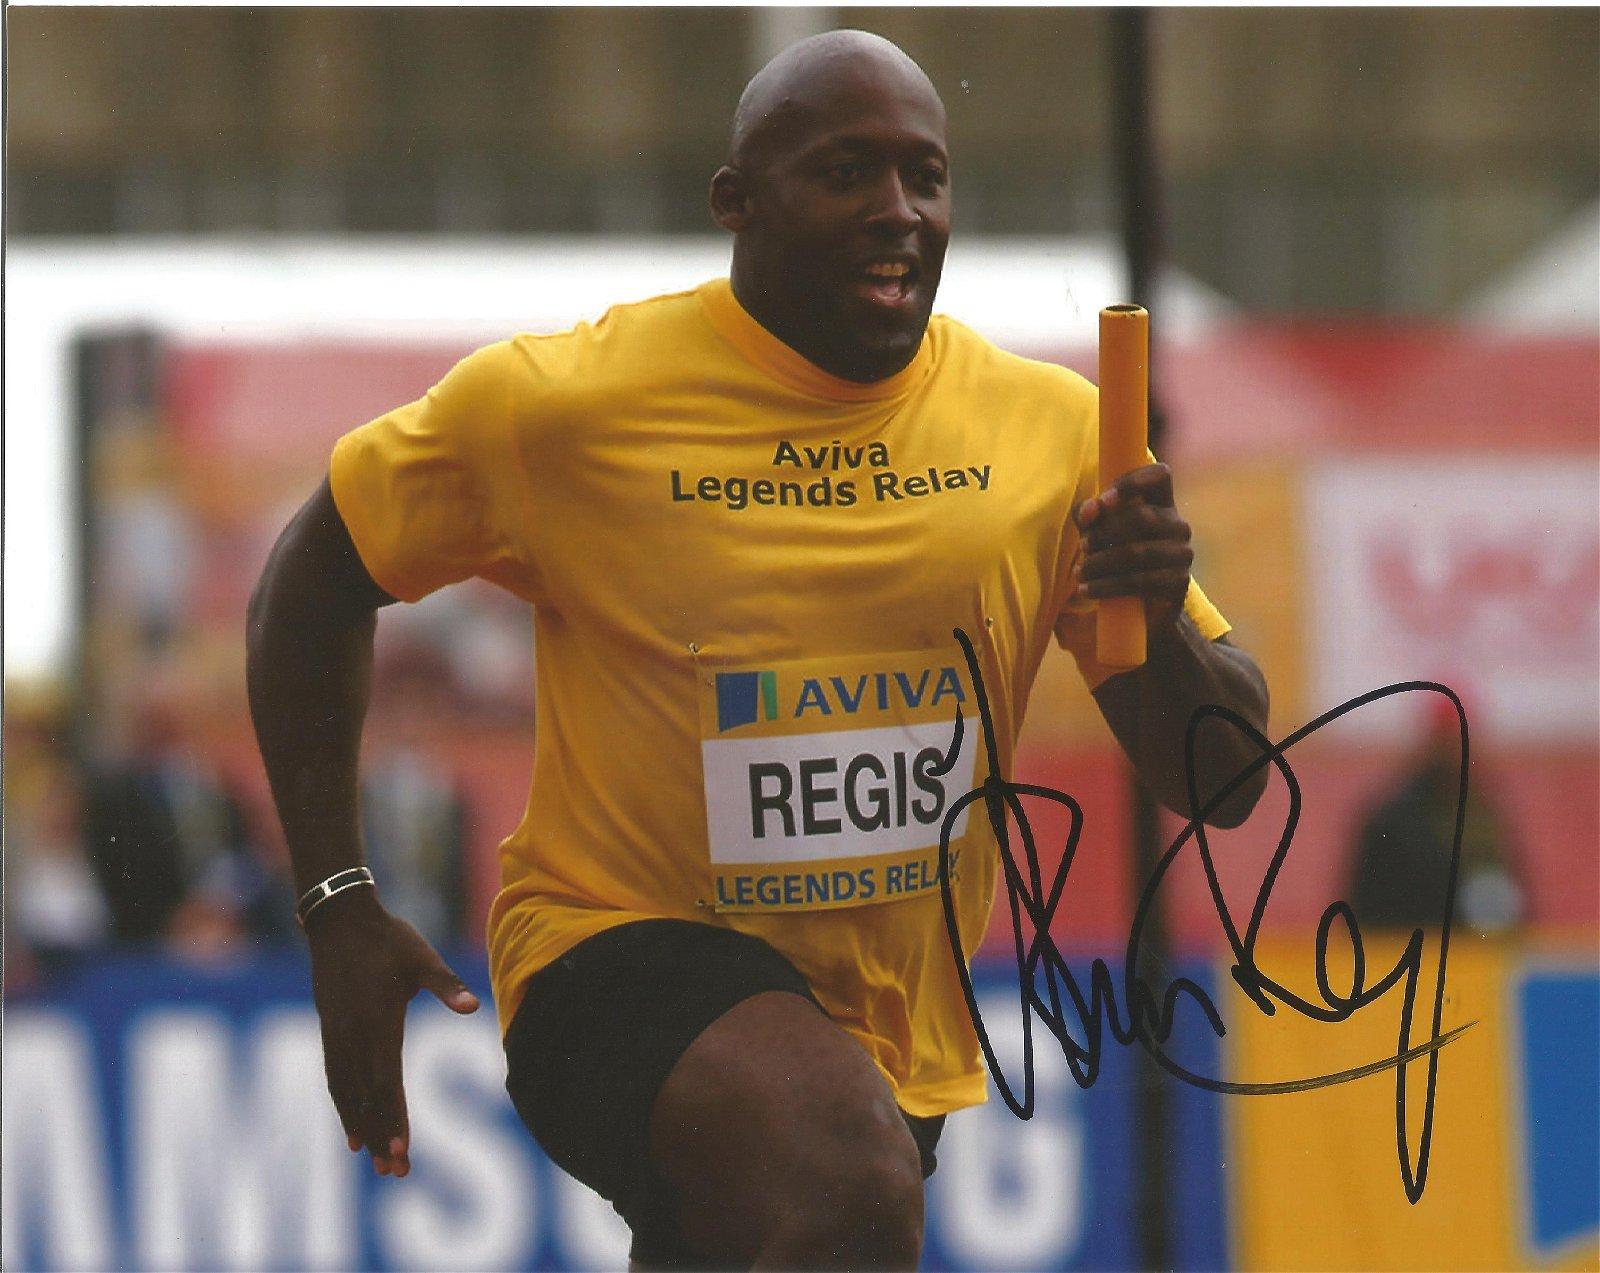 John Regis Signed Athletics 8x10 Photo . Good